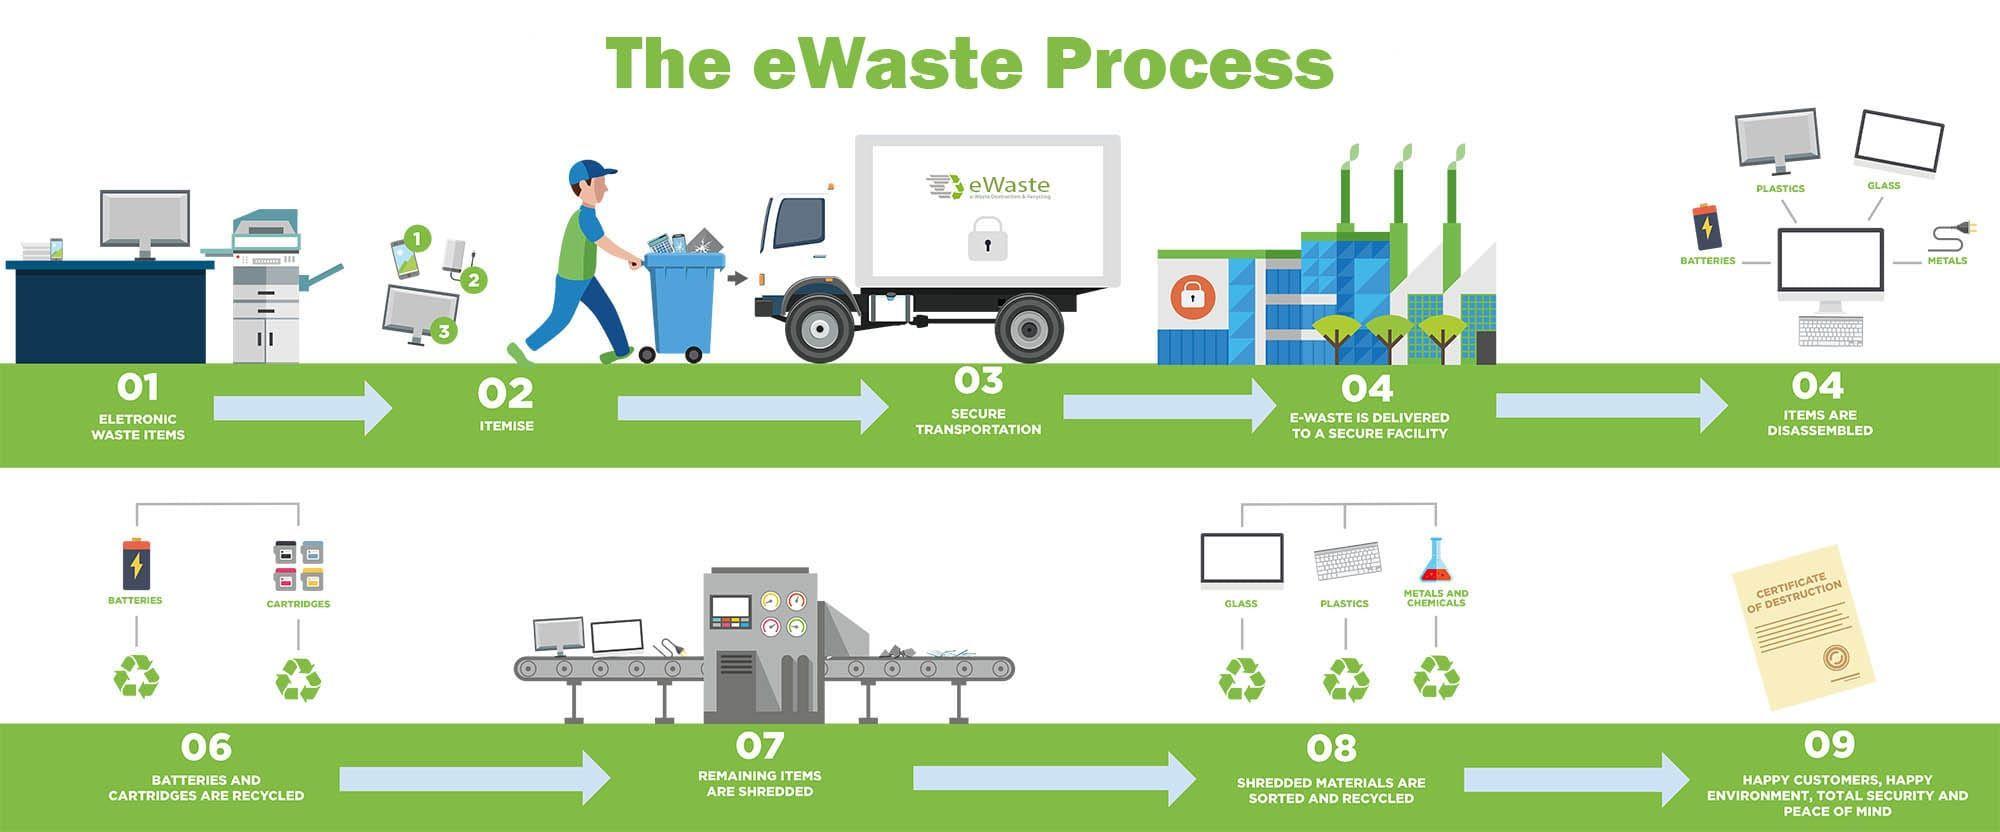 e-waste process